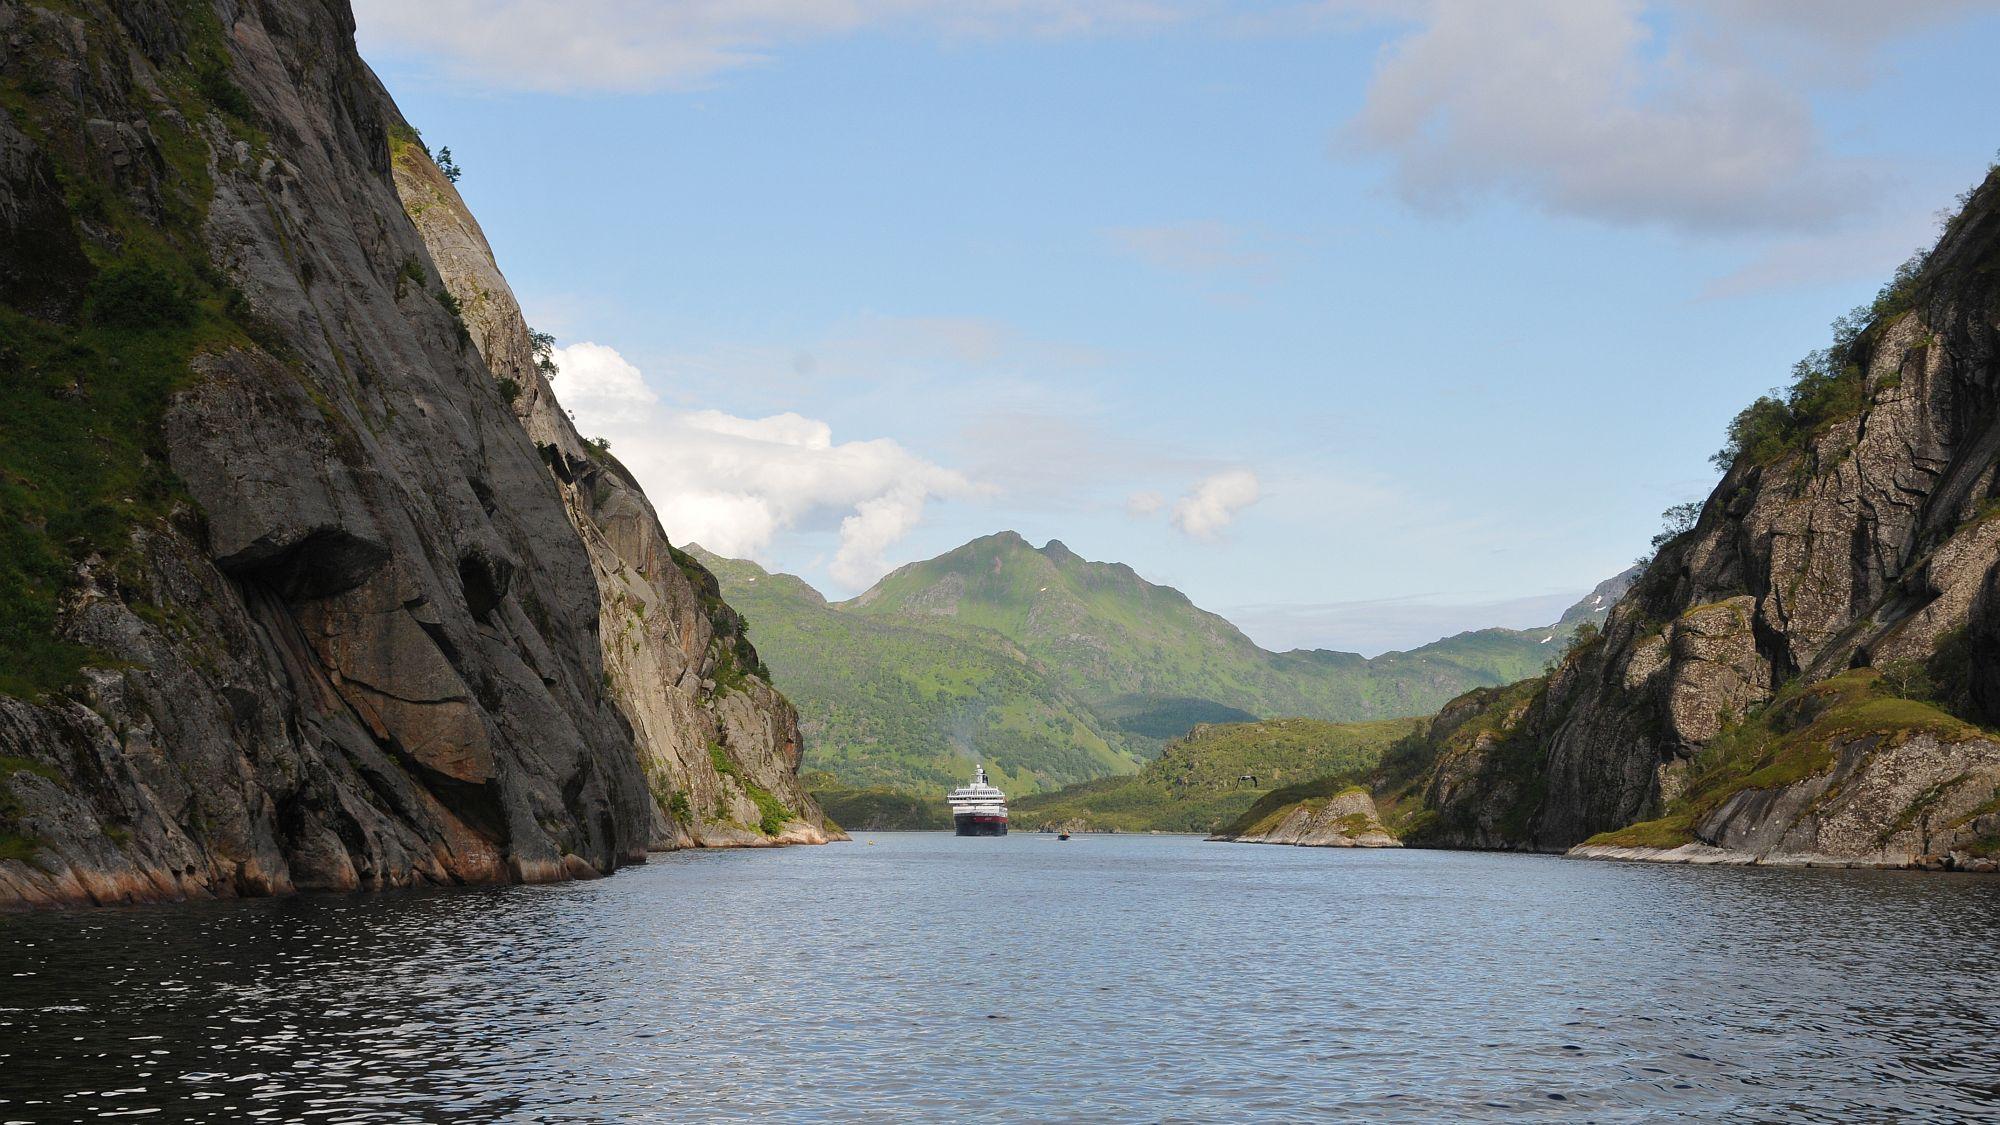 Hurtigrutenschiff im Trollfjord